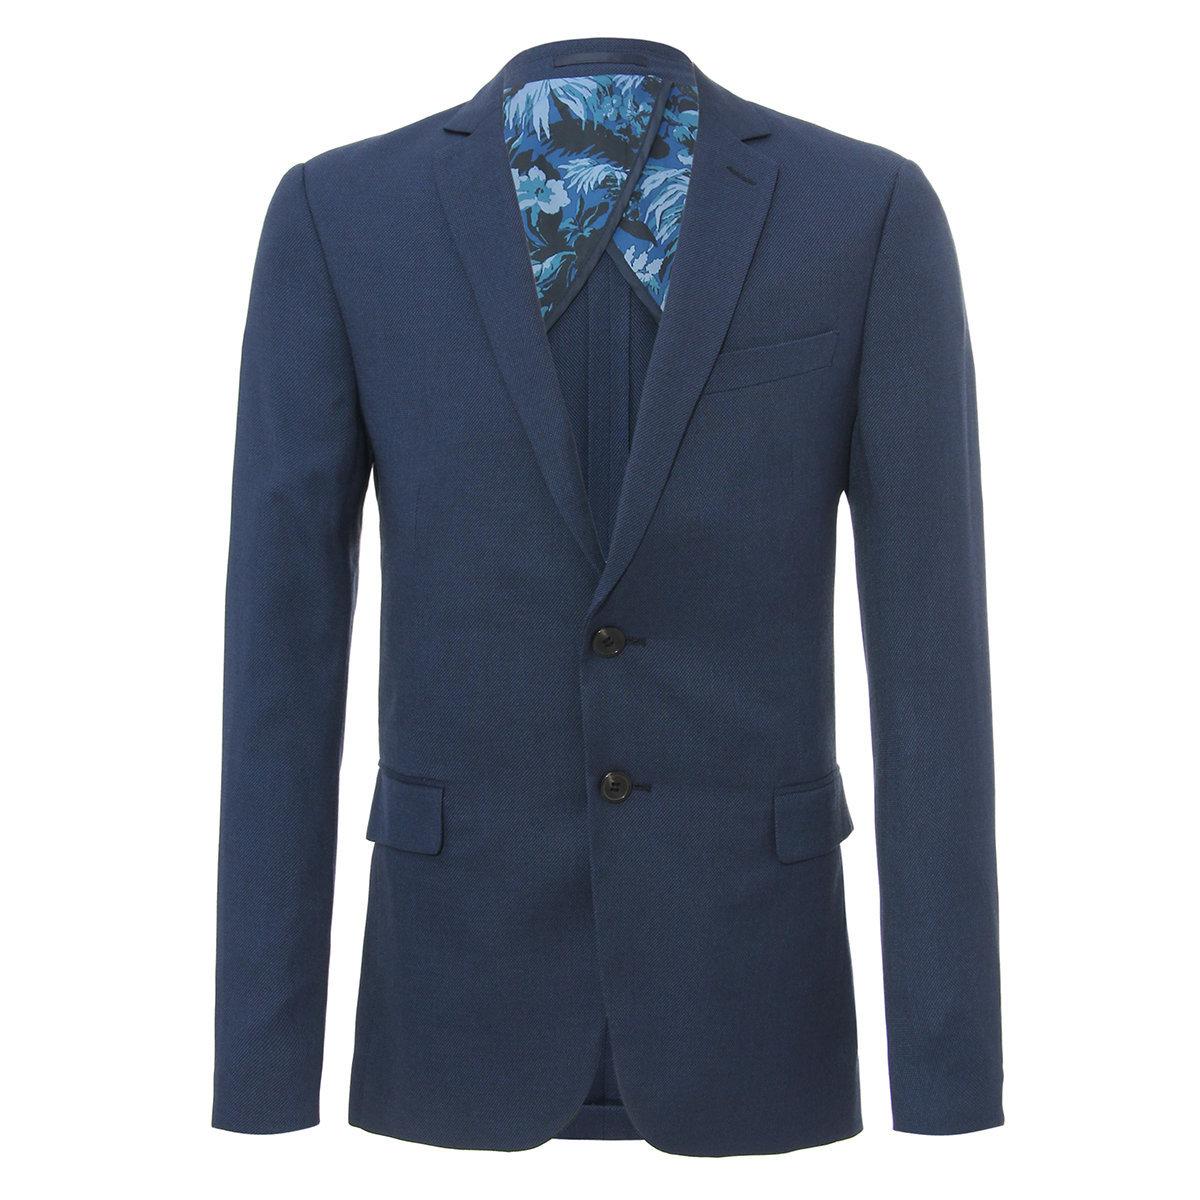 Men's Slim Fit Suit Blazer (Midlight Blue)